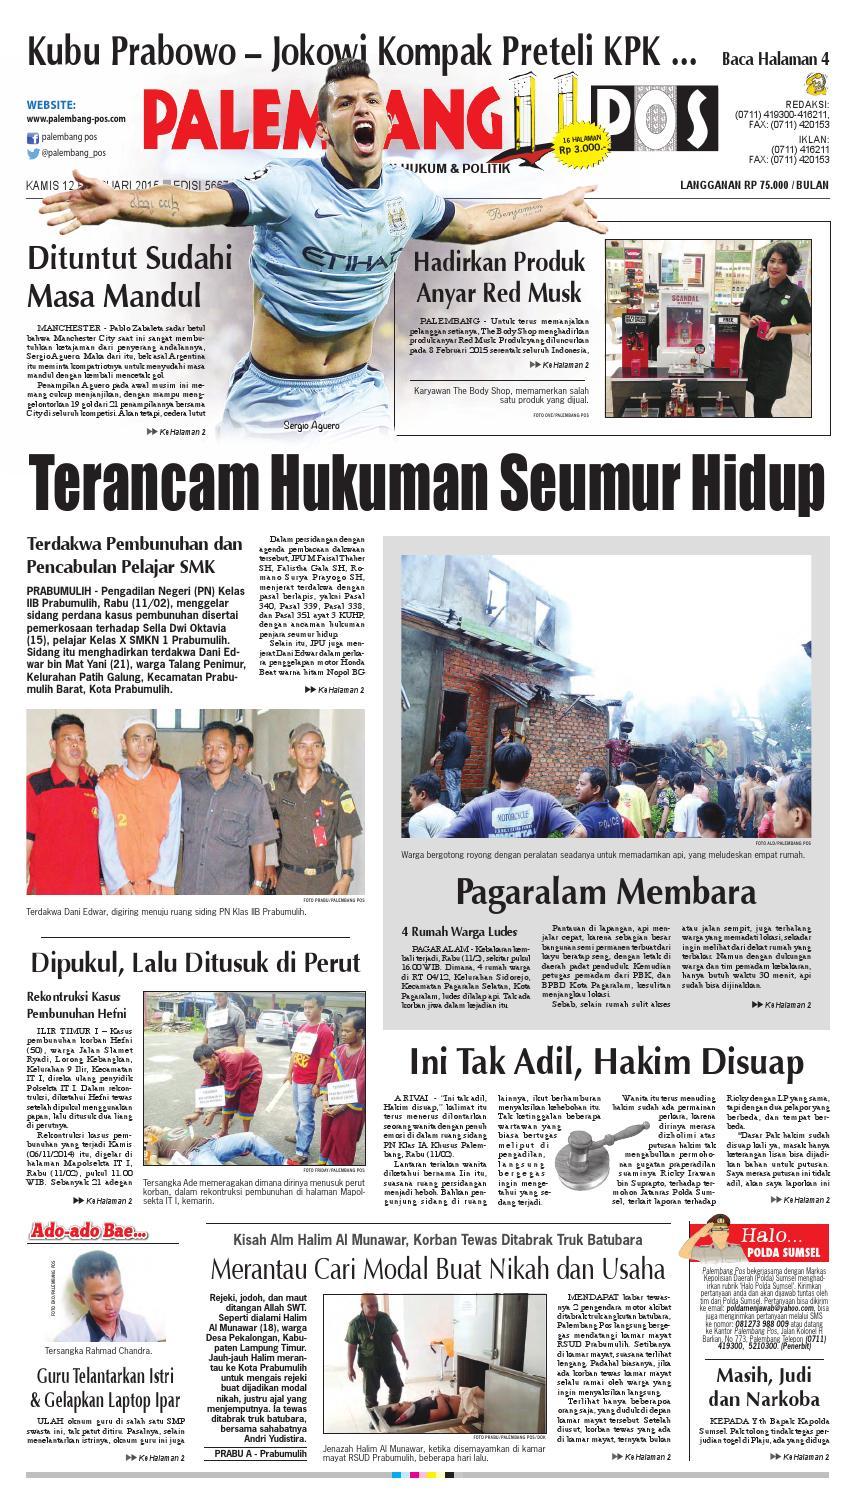 PALEMBANG POS EDISI KAMIS 12 FEBRUARI 2015 by Palembang Pos - issuu 29e1194a06